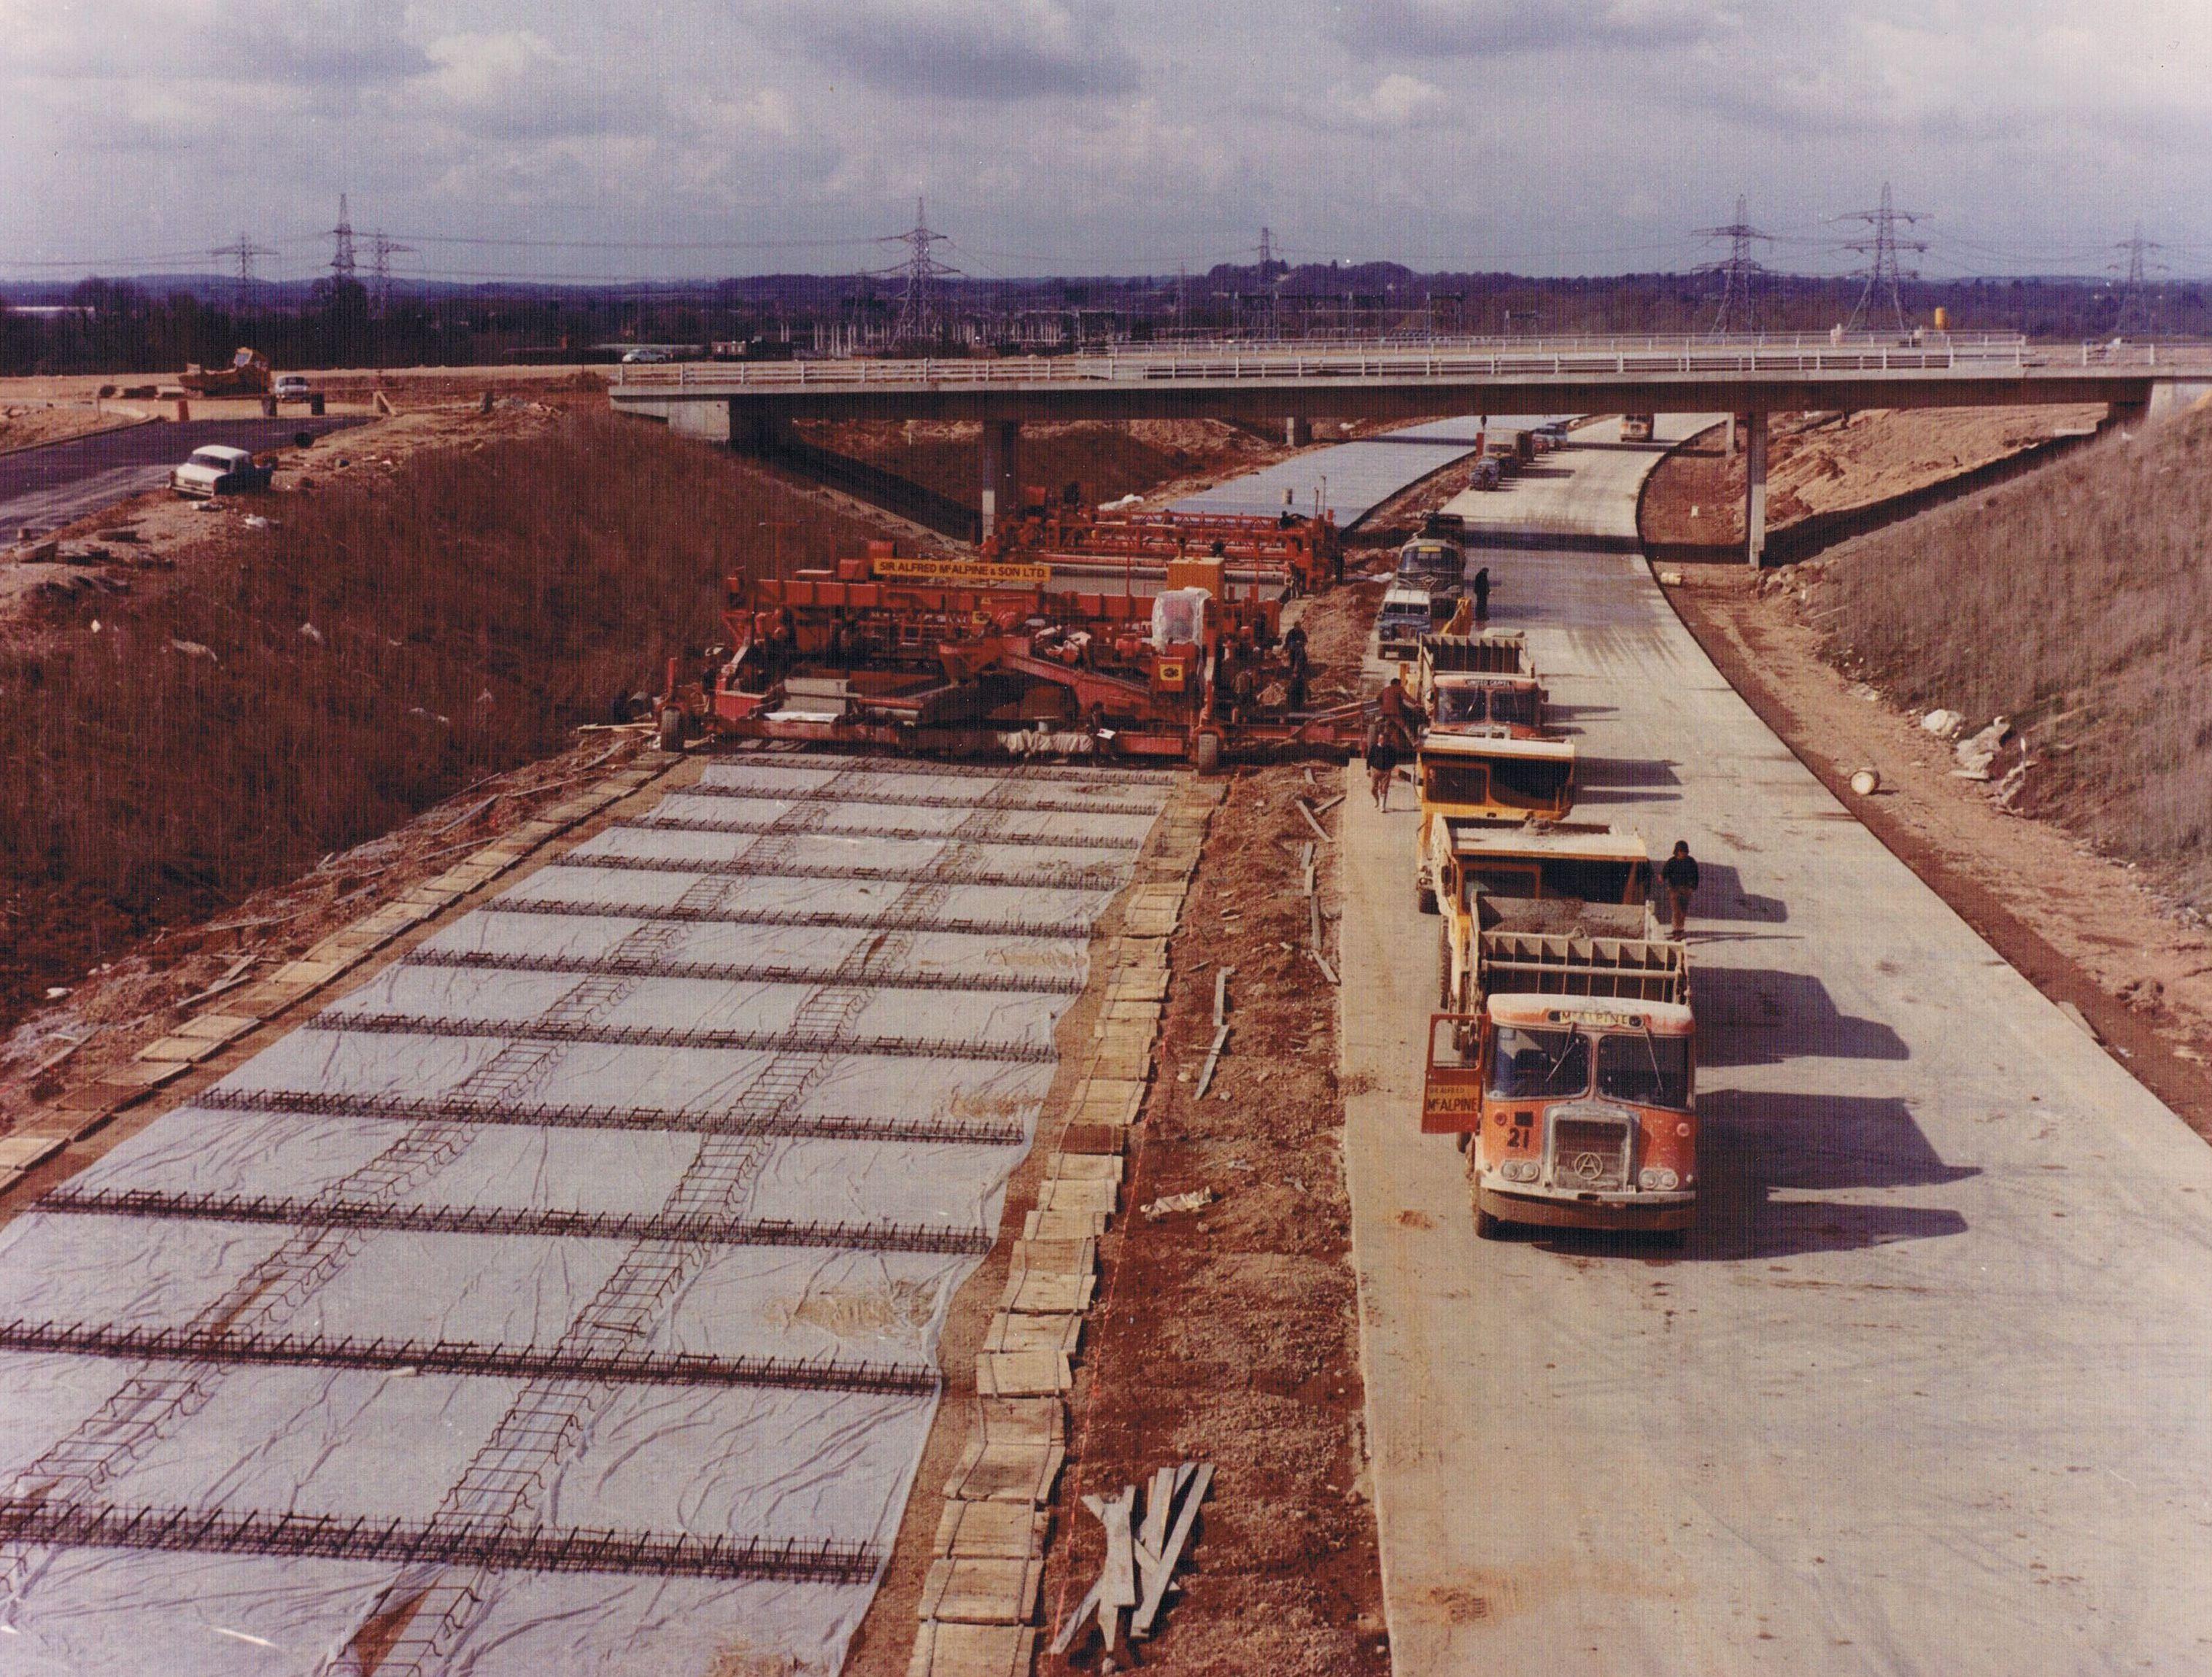 Howard Stevens Concrete Train The British Library